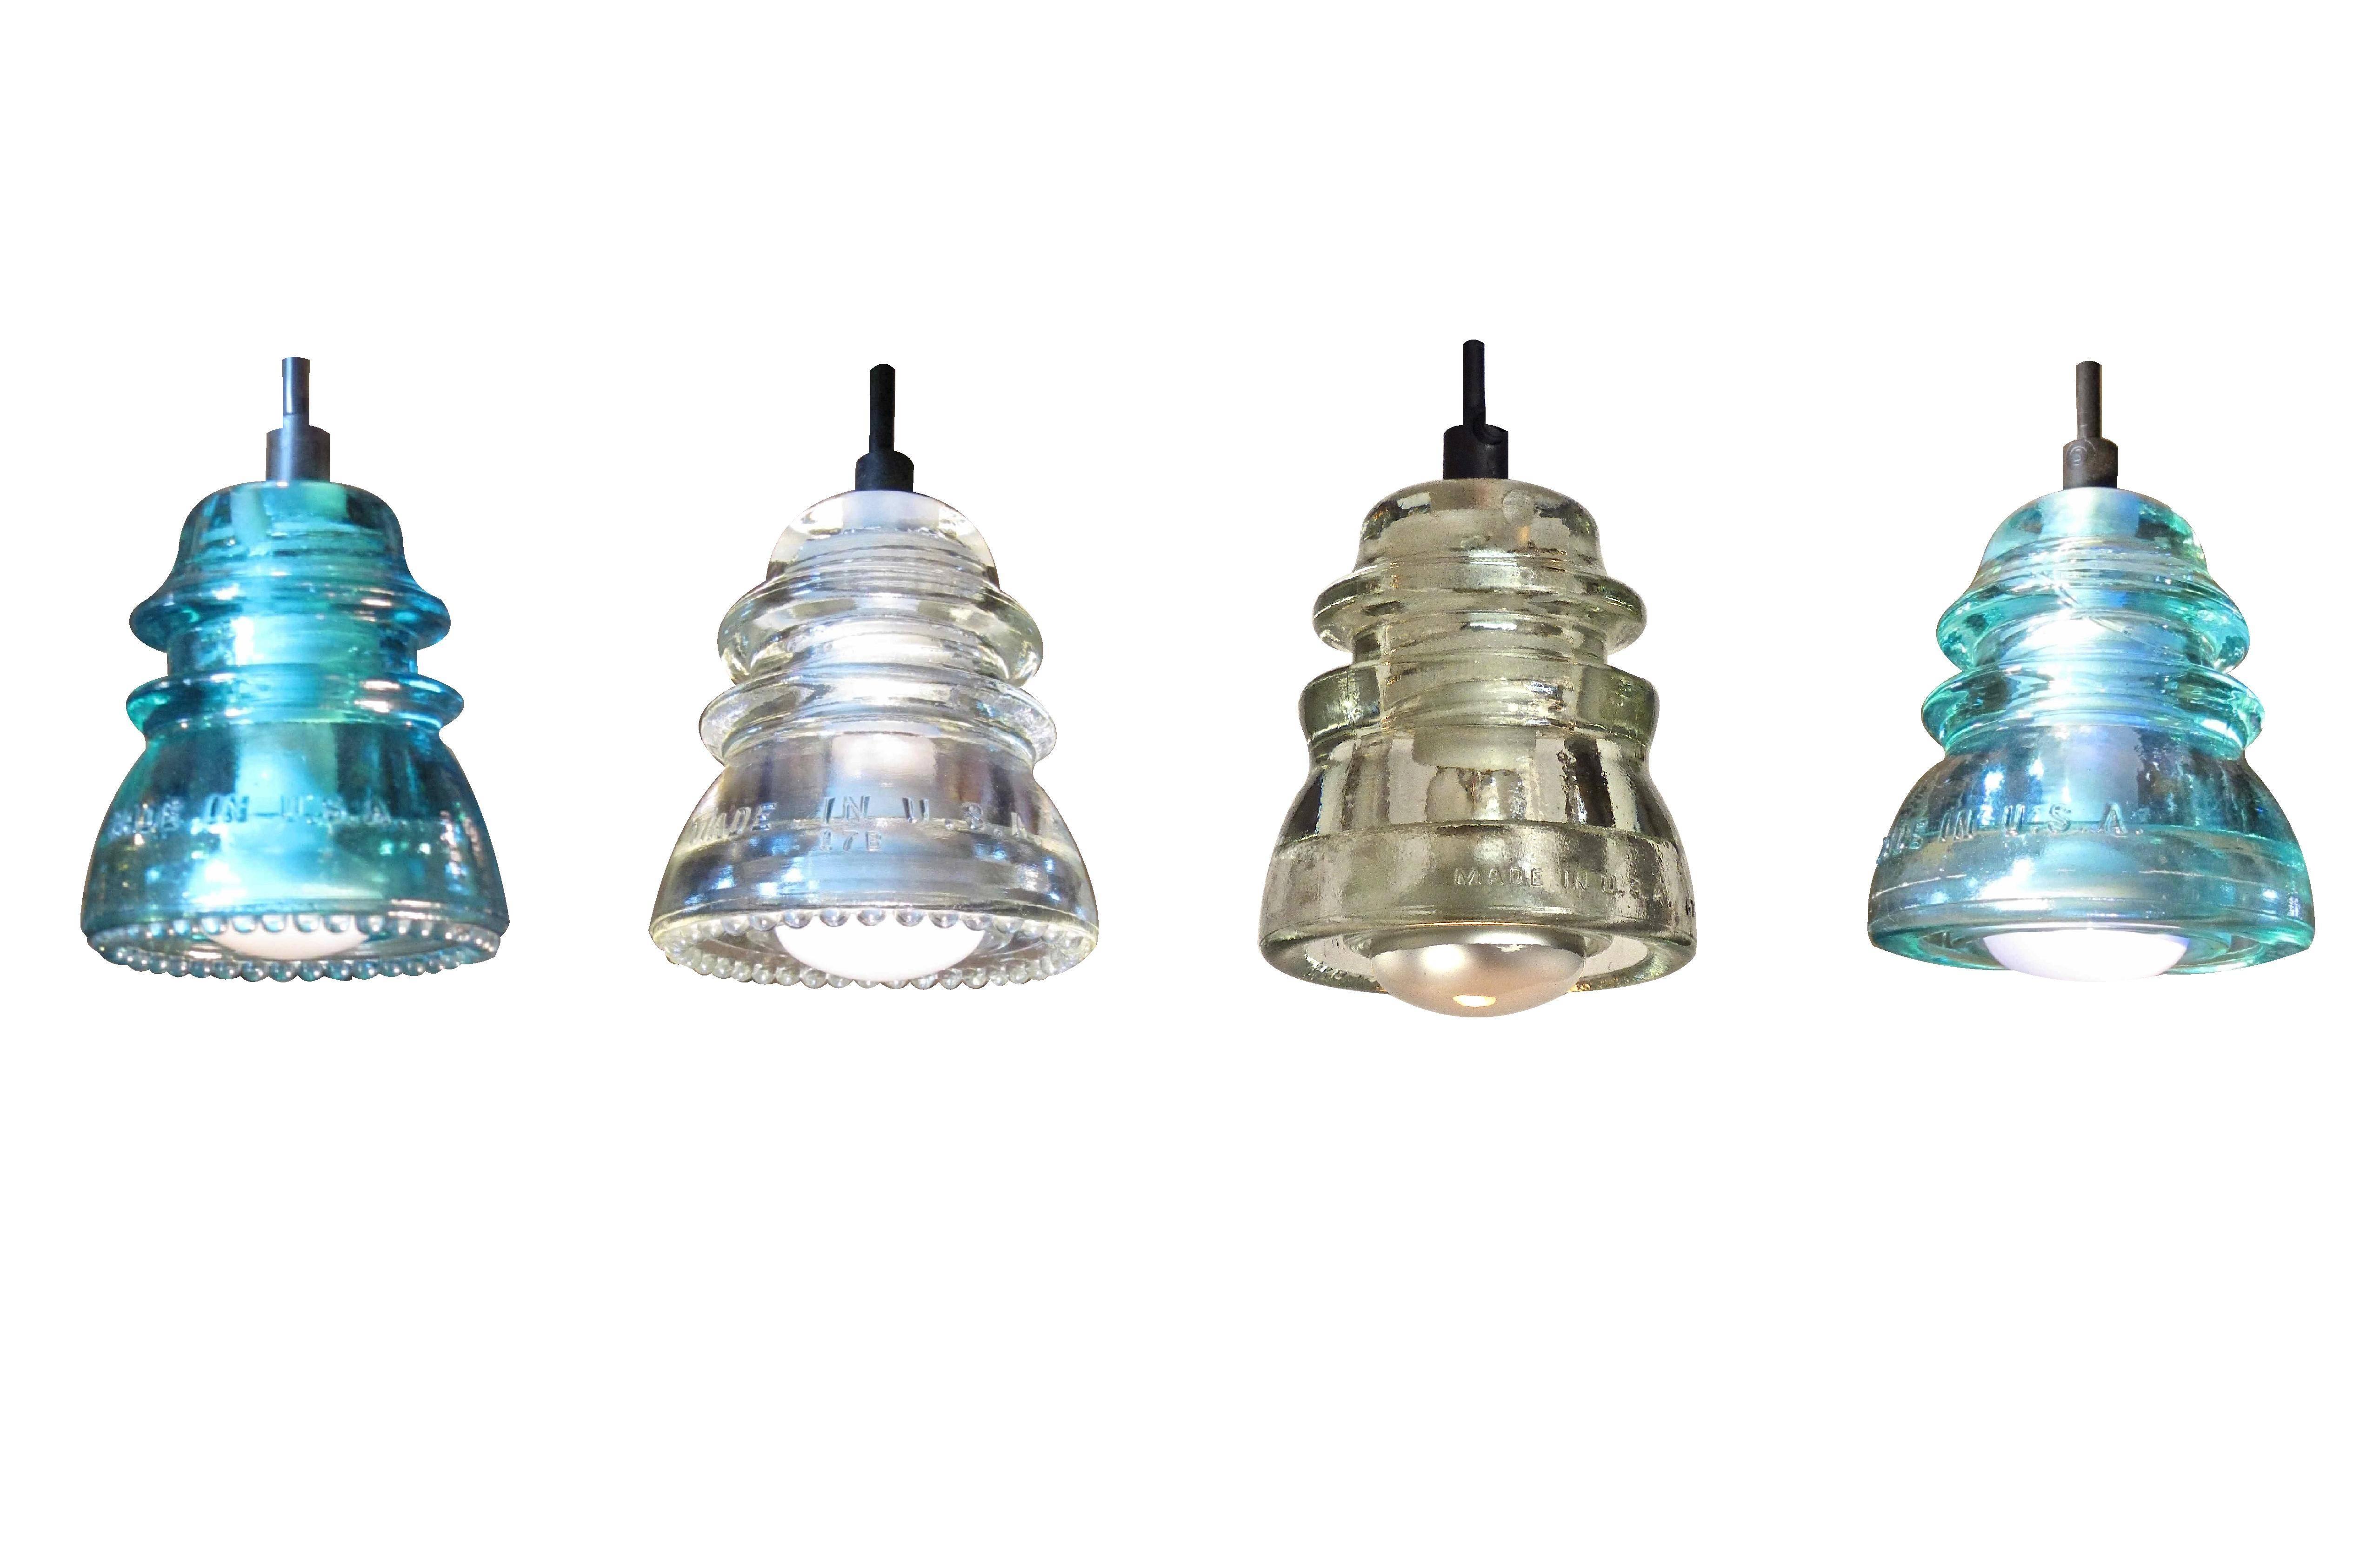 "Insulator Light Pendant 7"" Rusted Metal Hood 120V/40W Bulb in Insulator Pendant Lights (Image 4 of 15)"